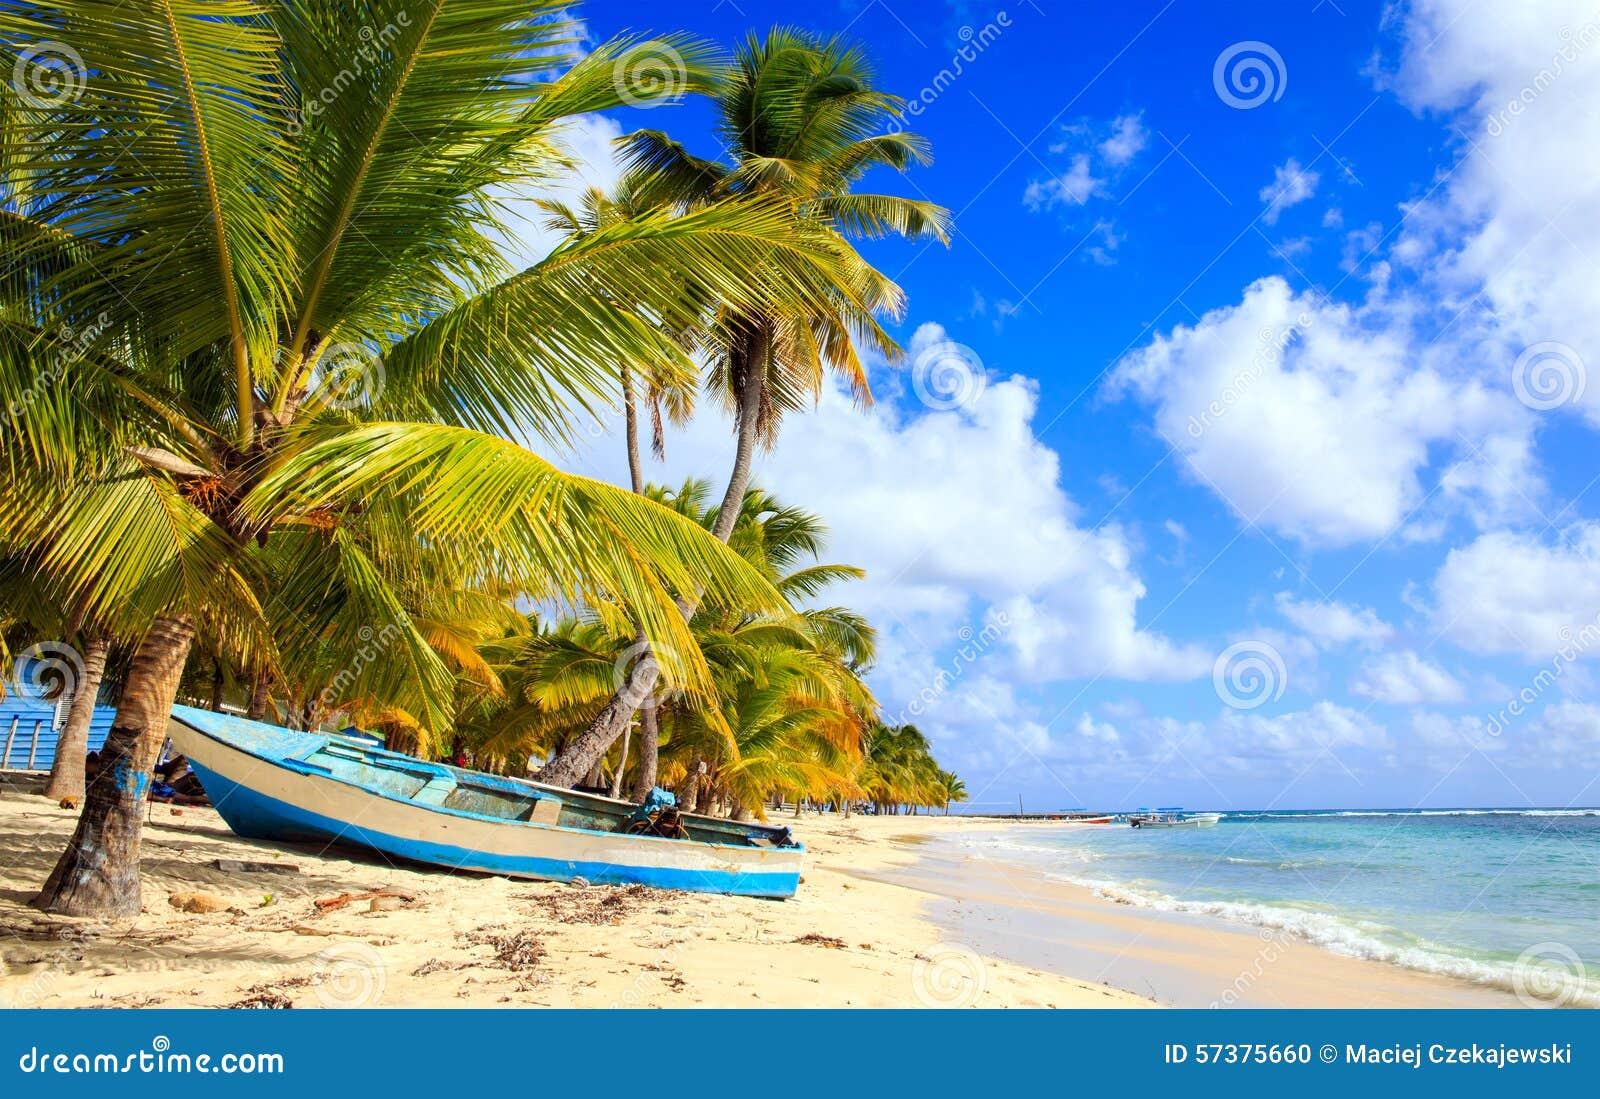 Karibisk strand i Dominikanska republiken